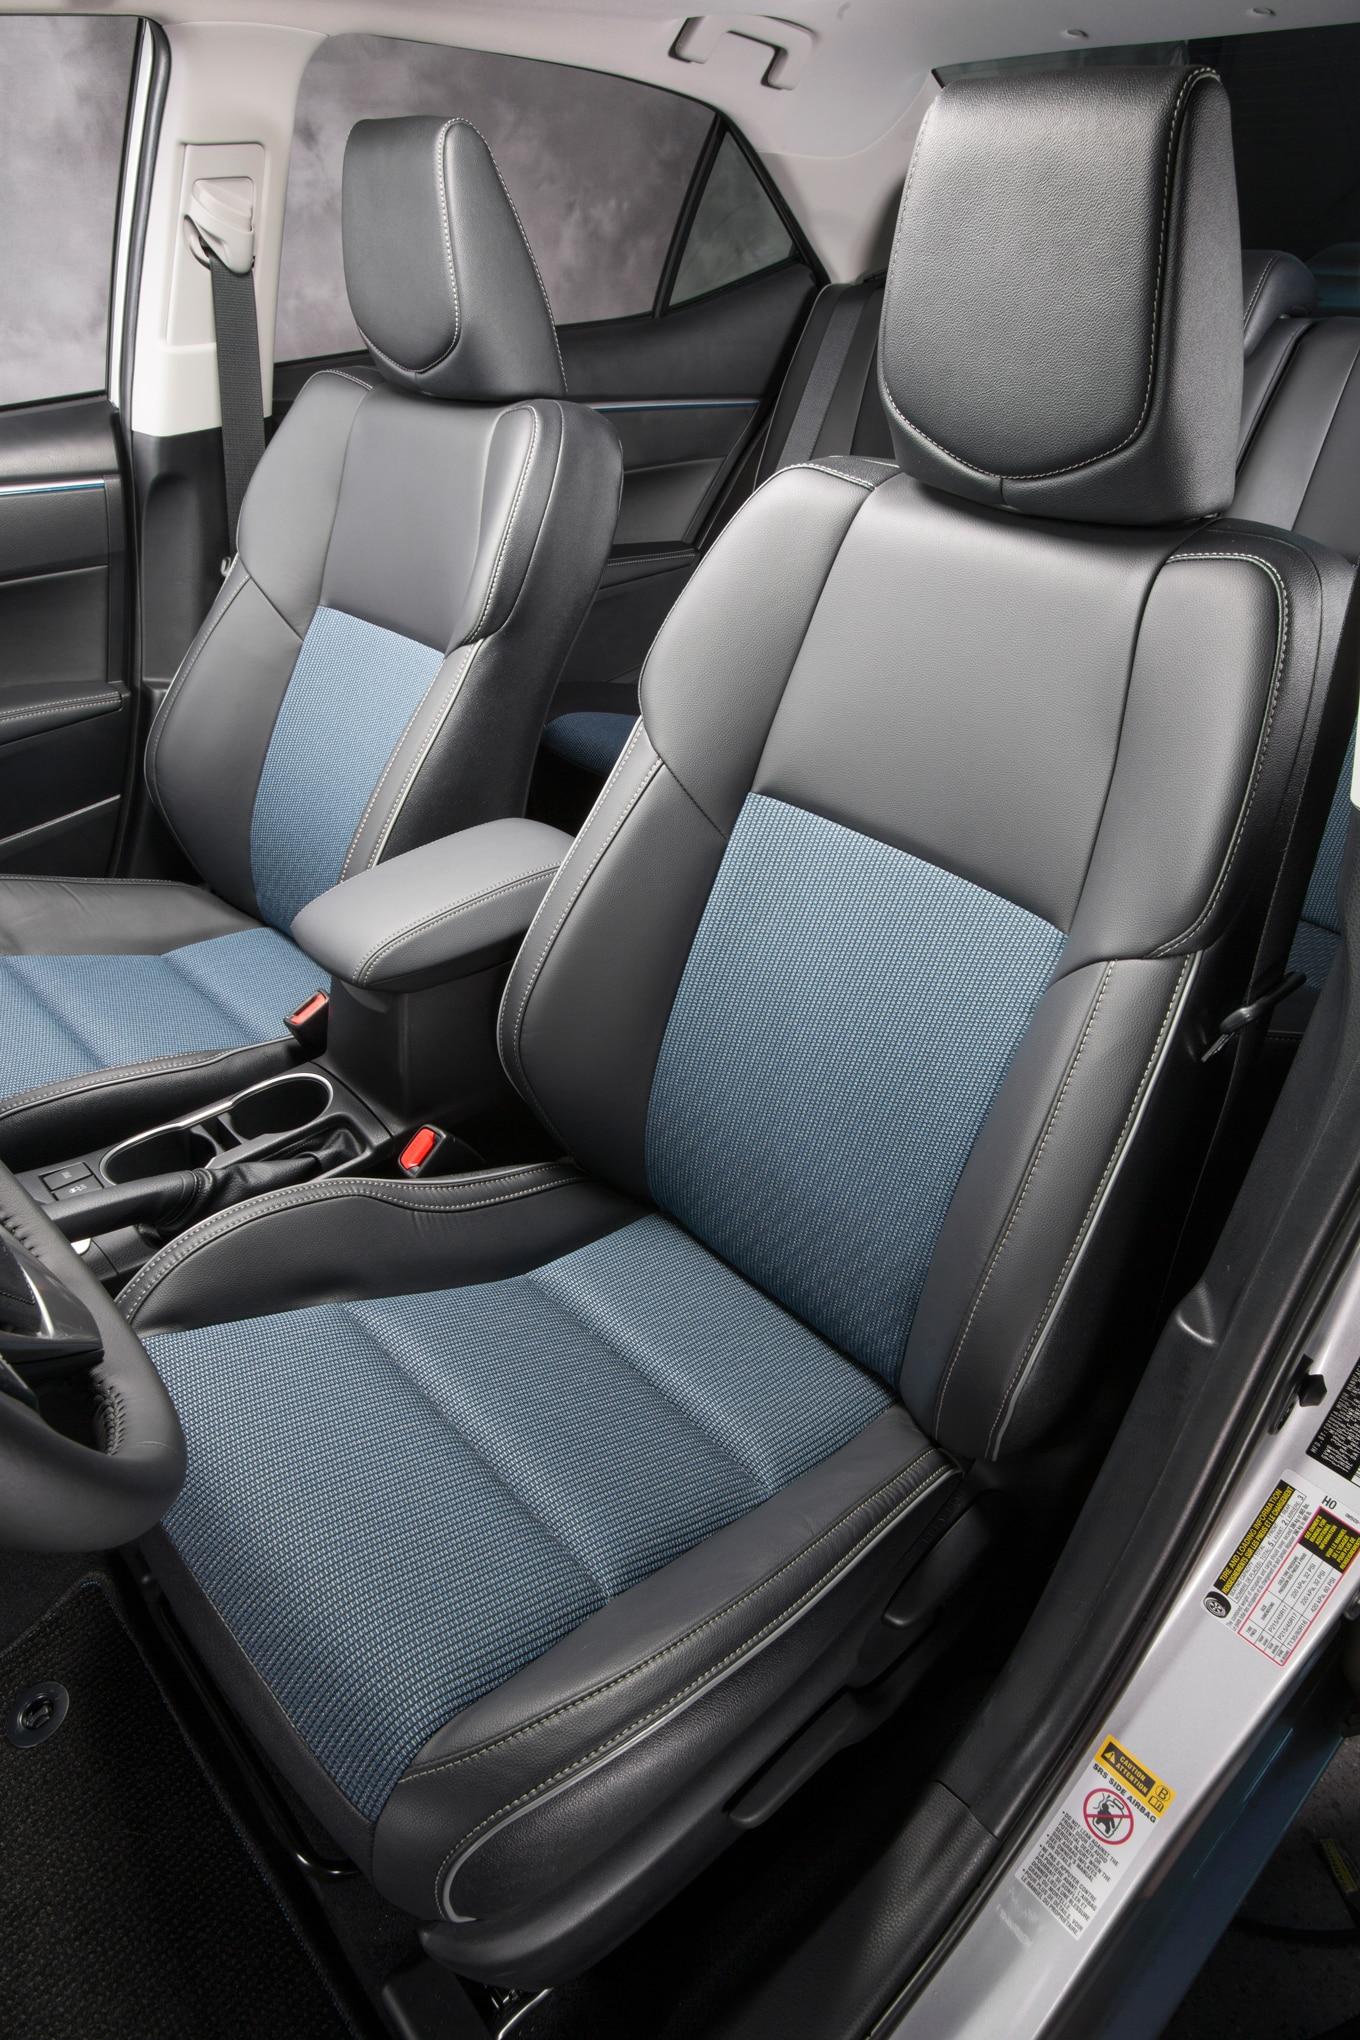 toyota corolla 2015 interior seats. 2014 toyota corolla s 51250 2015 interior seats